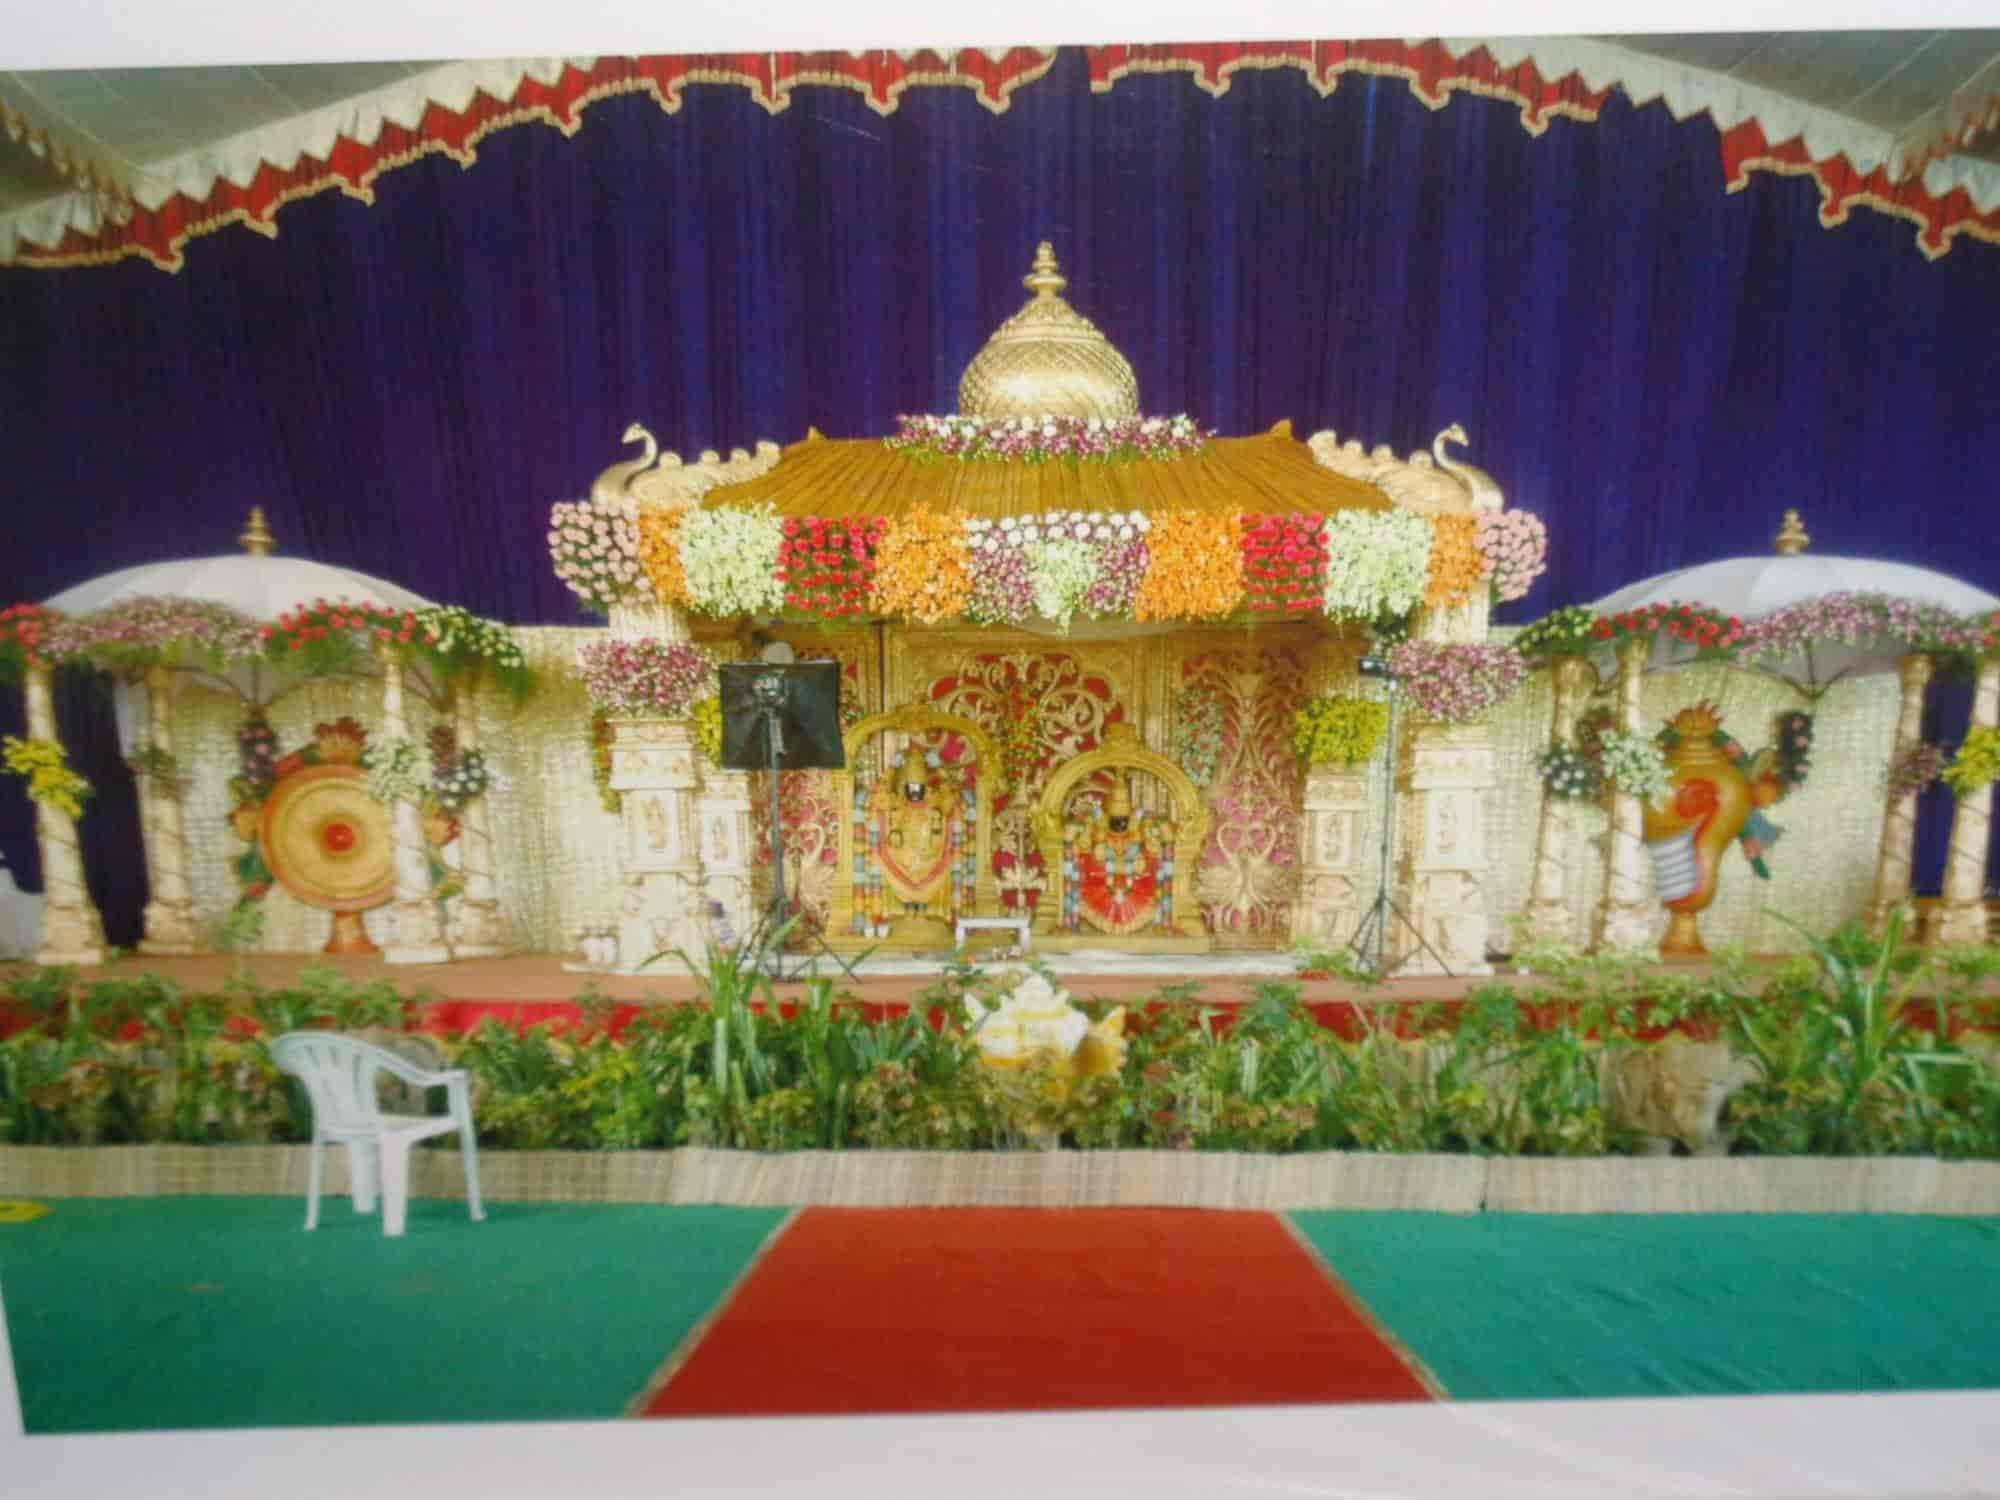 Sree Vigneshwara Flower Decoration Photos, Moosarambagh, Hyderabad ...